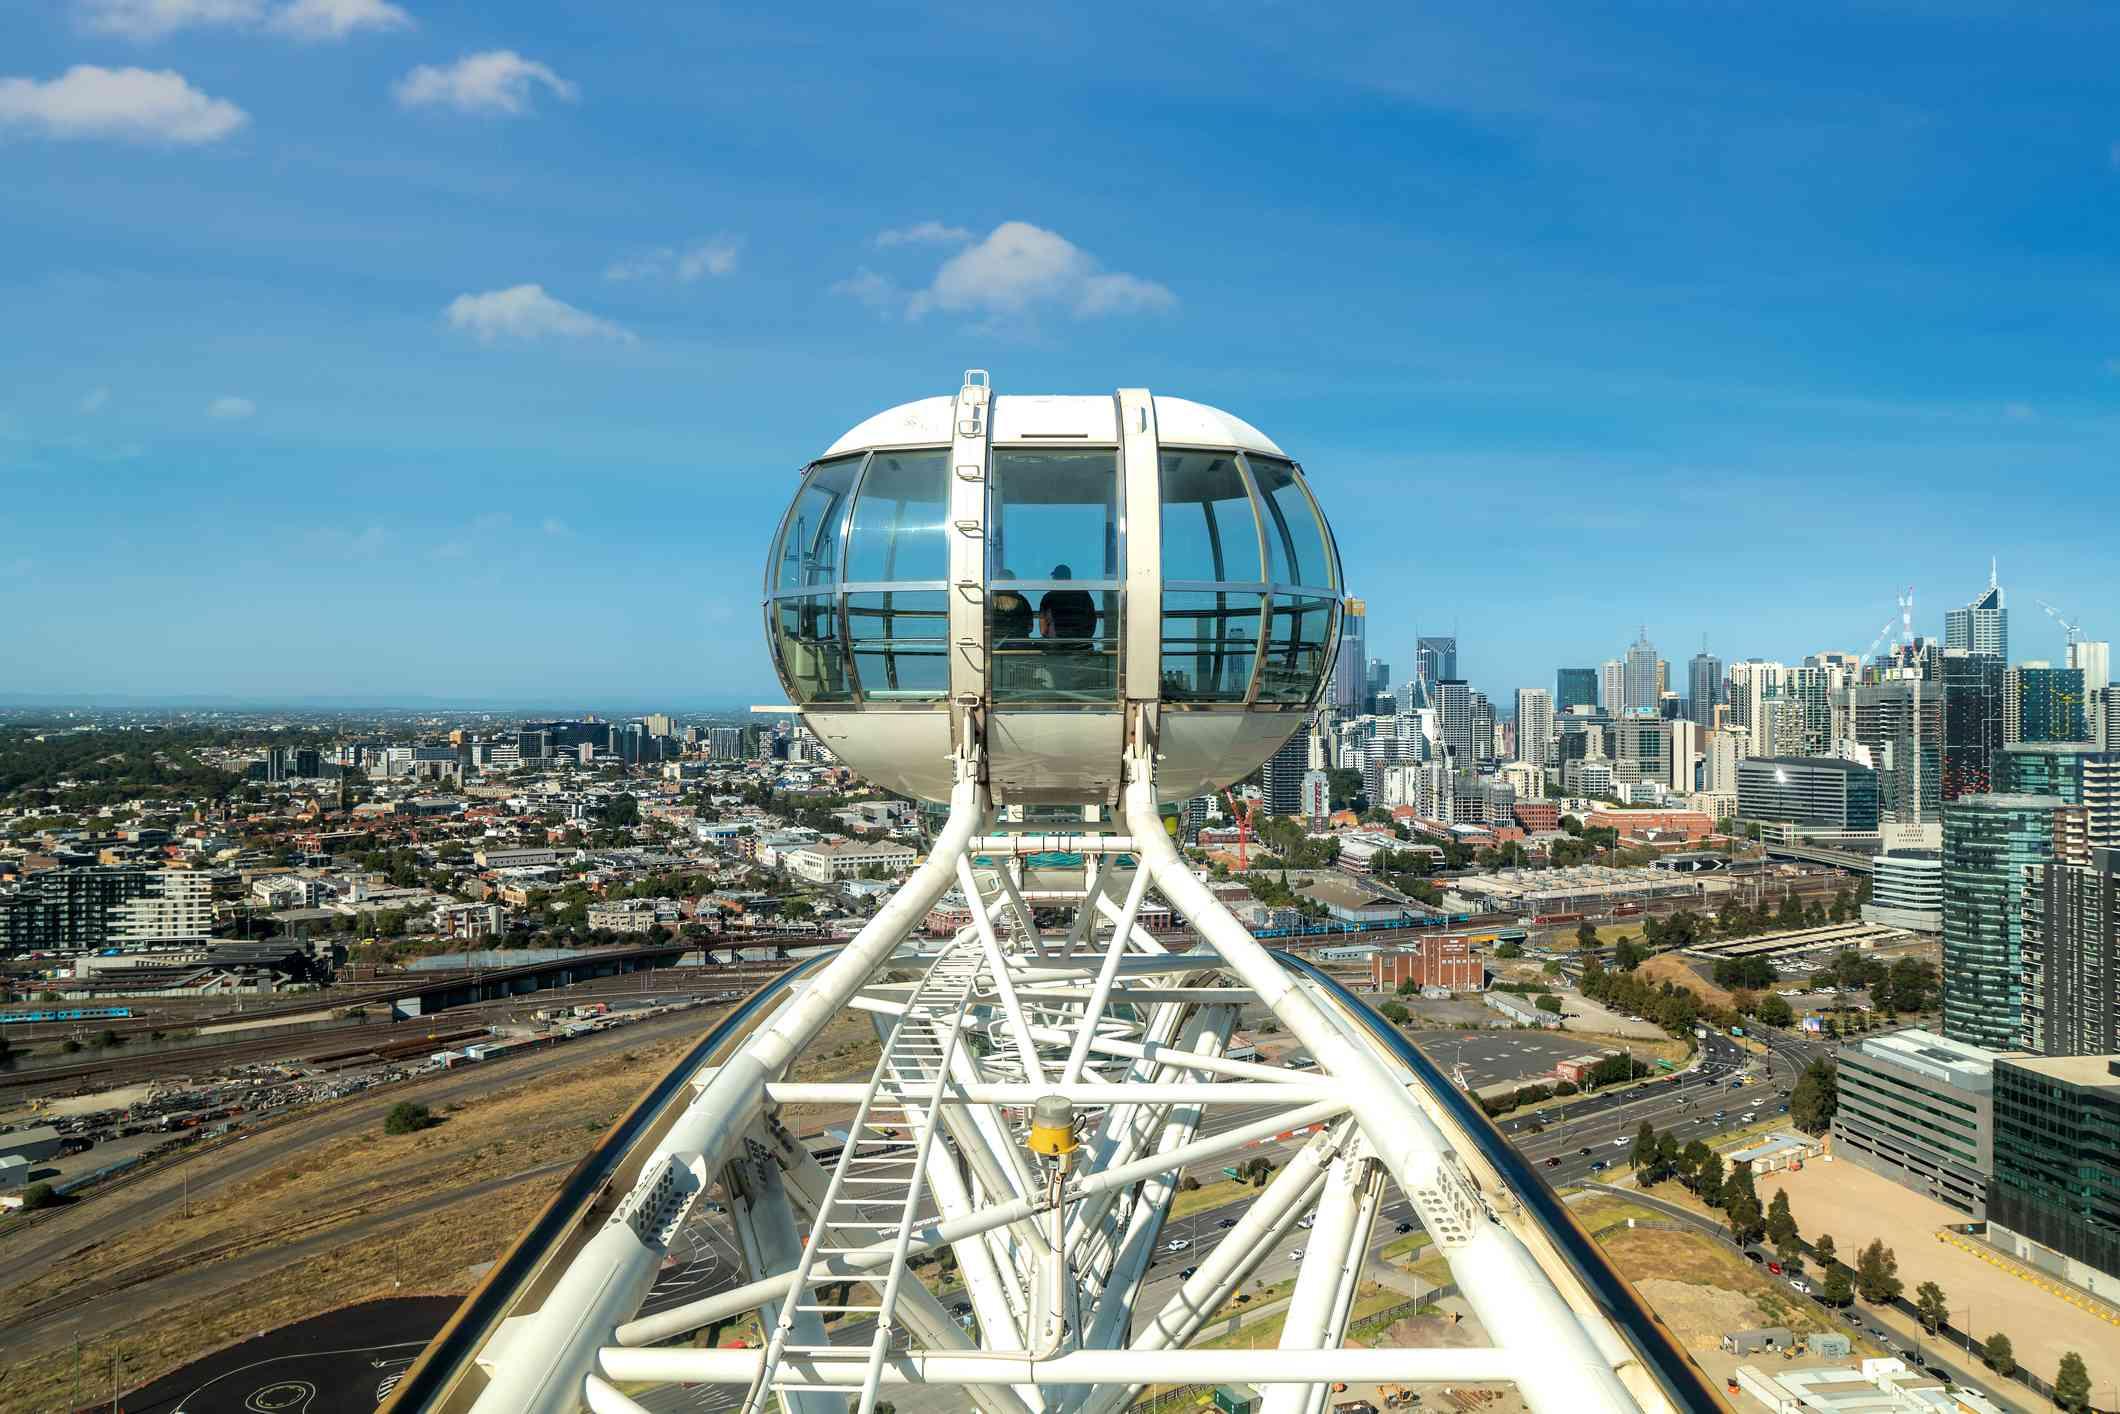 Observation ferris wheel in Docklands district in Melbourne, Australia.